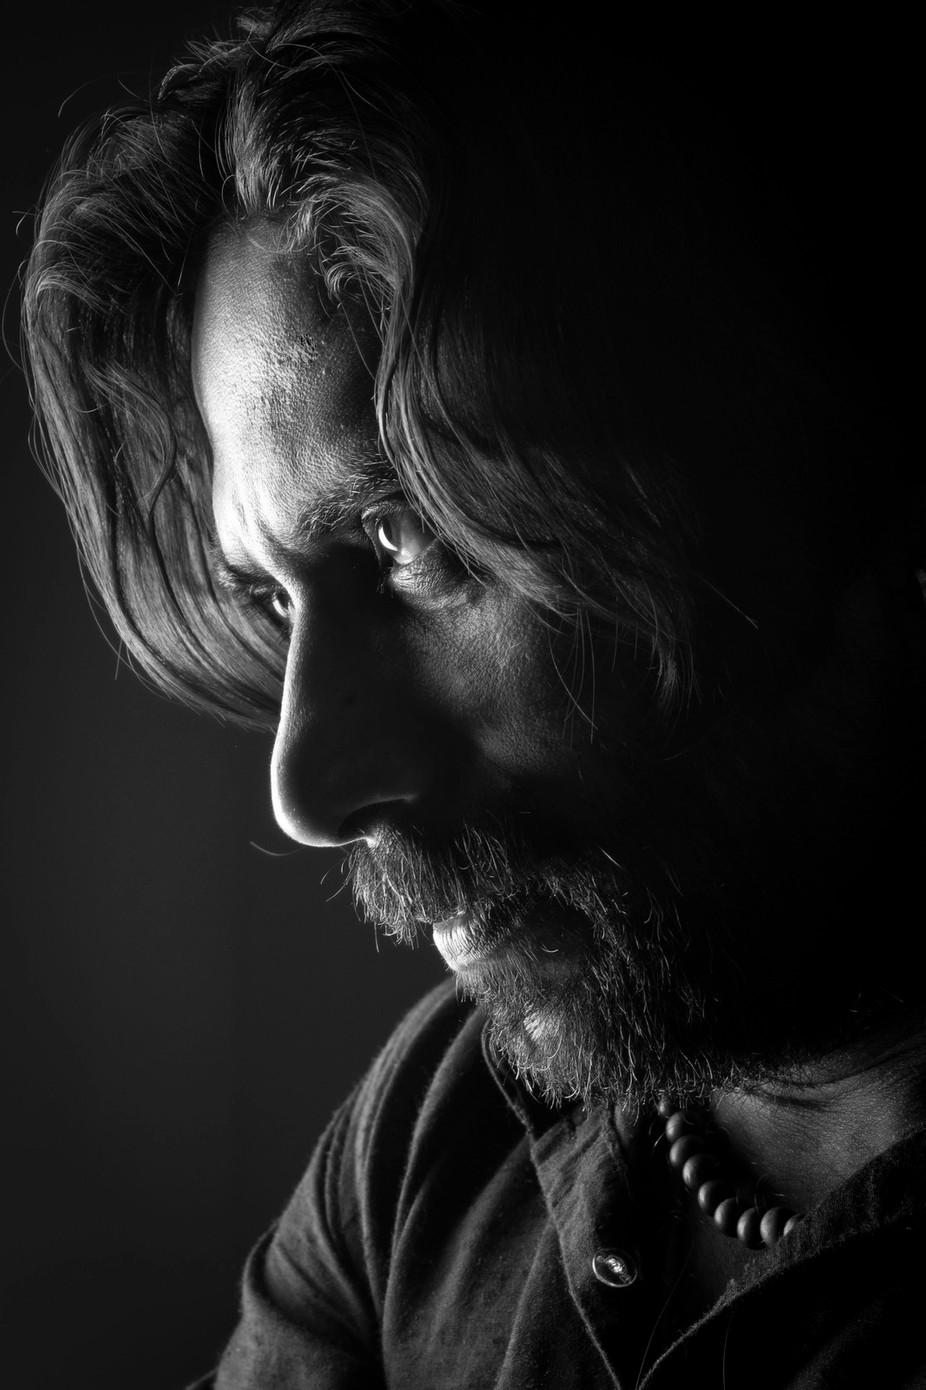 strange by riteshrc - Dark Portraits Photo Contest